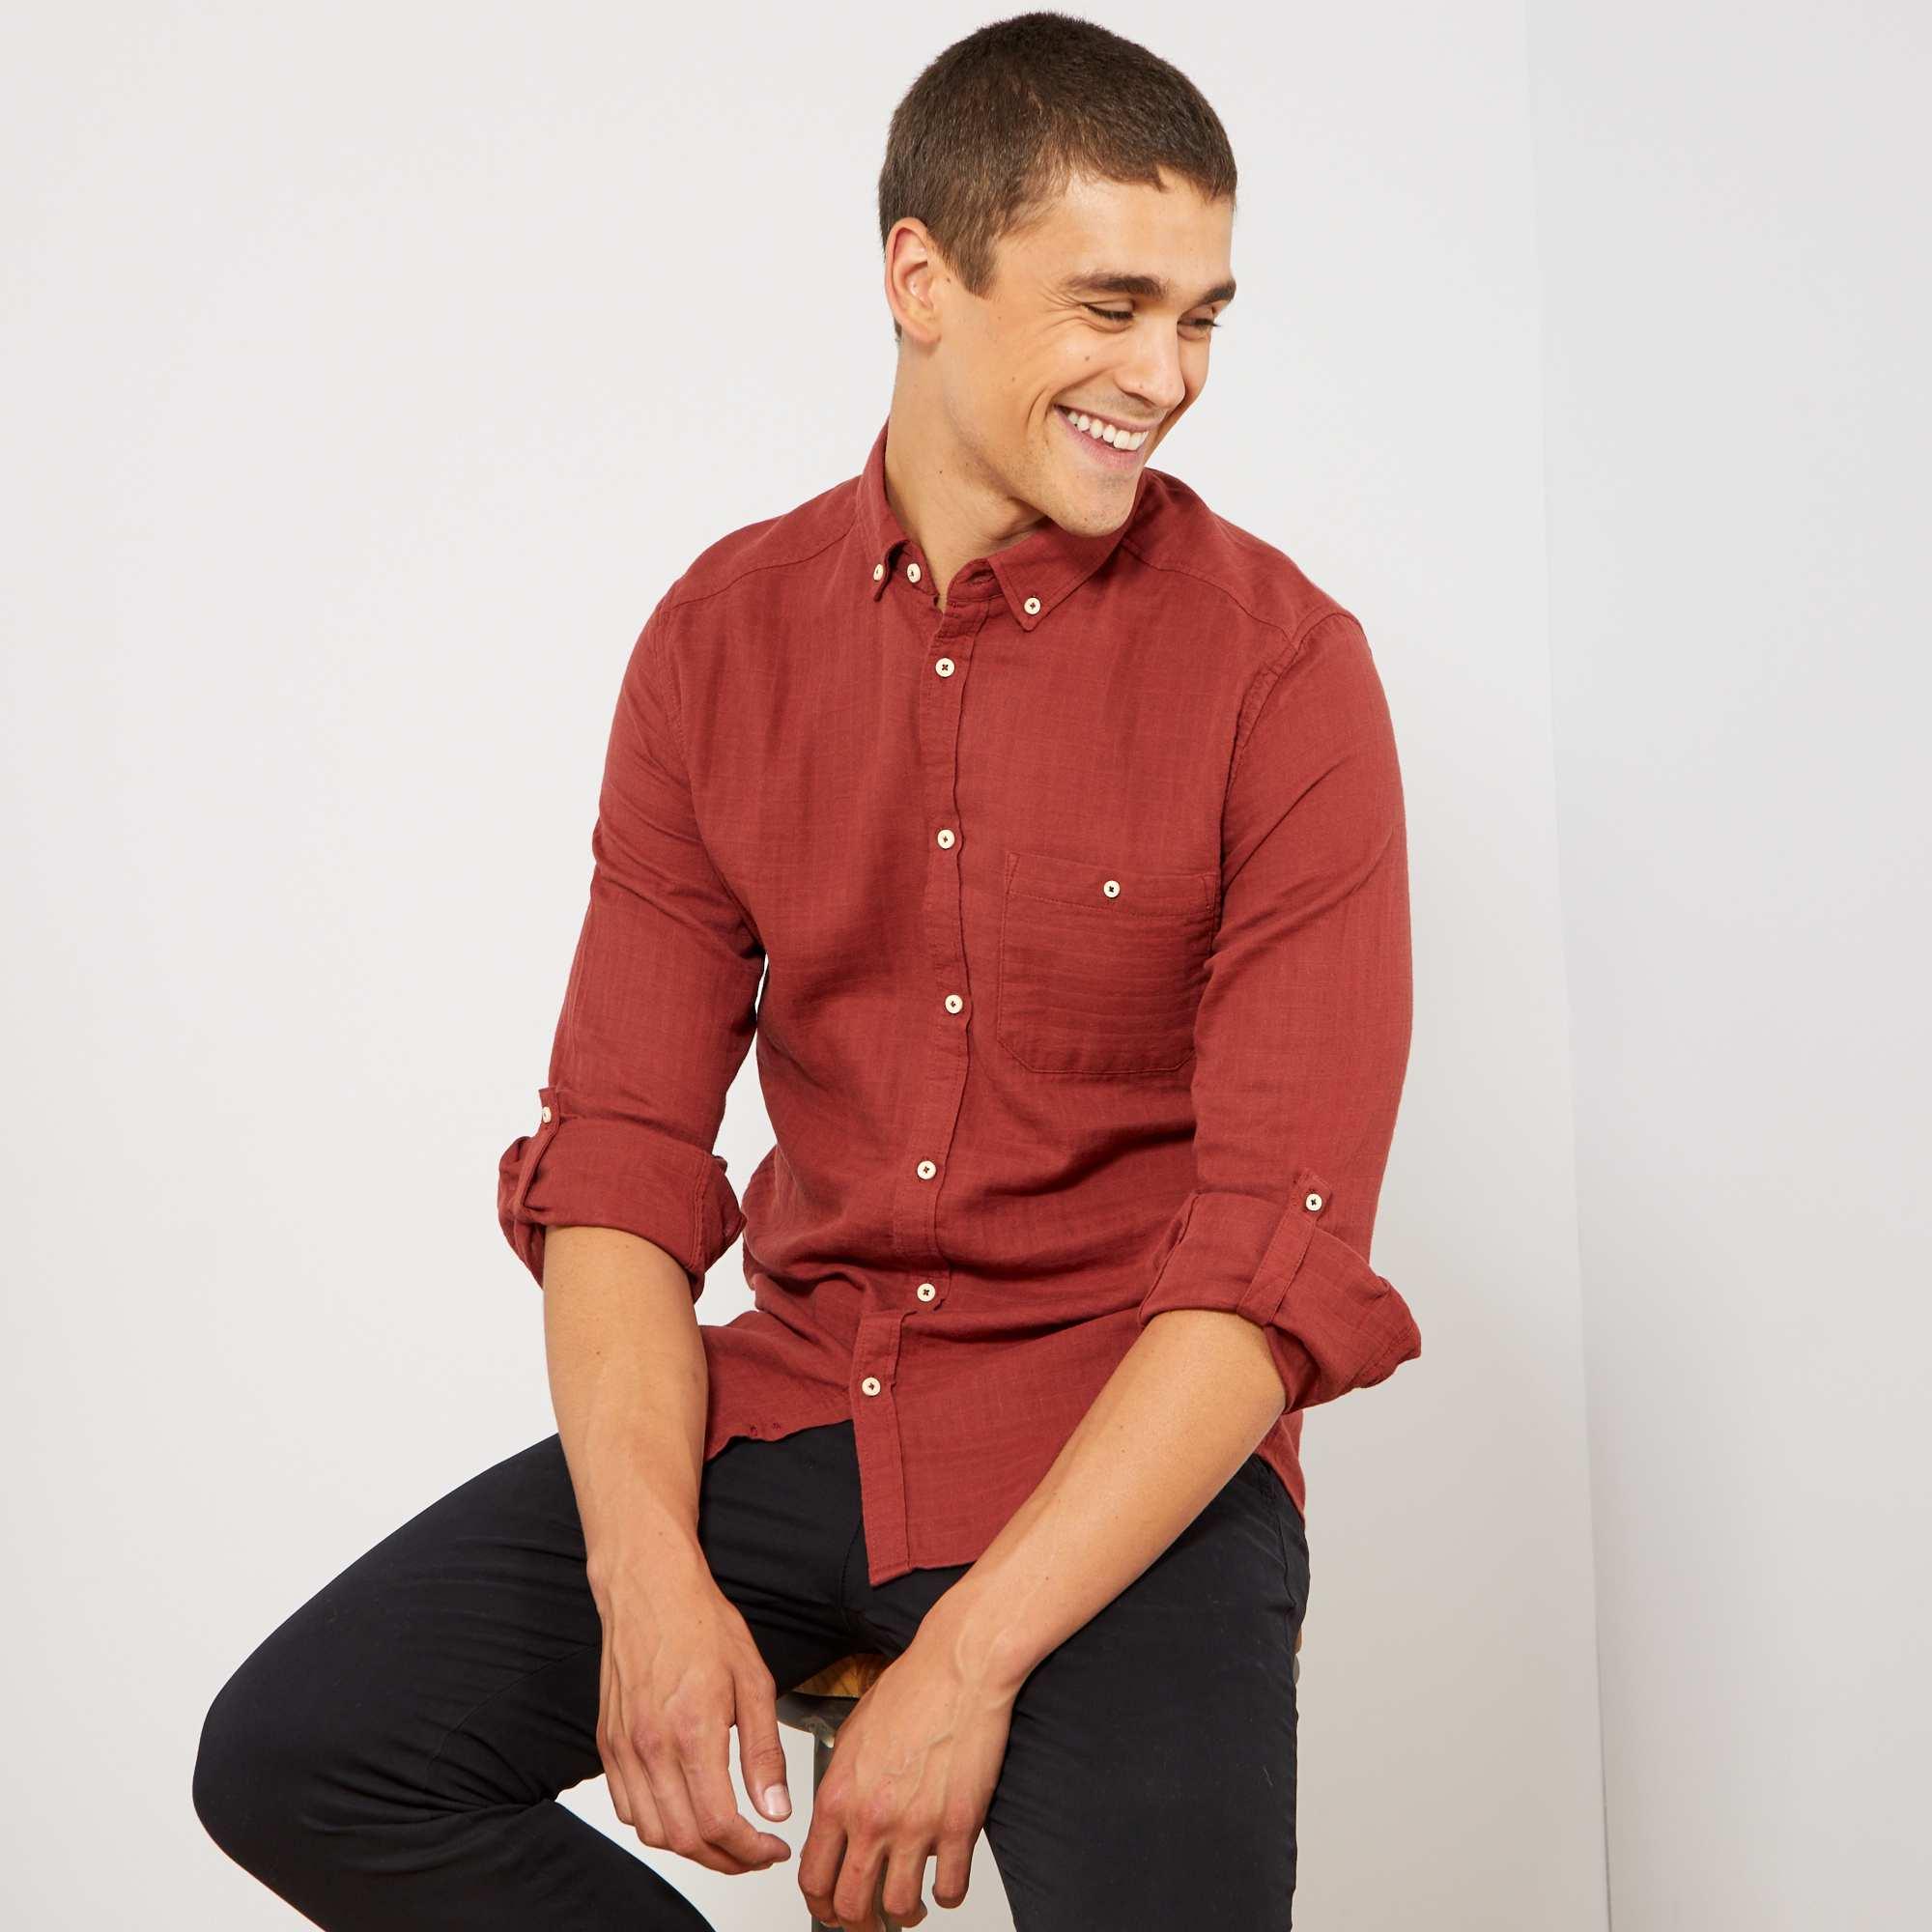 5040d73a Camisa slim con textura Hombre - MARRON - Kiabi - 15,00€